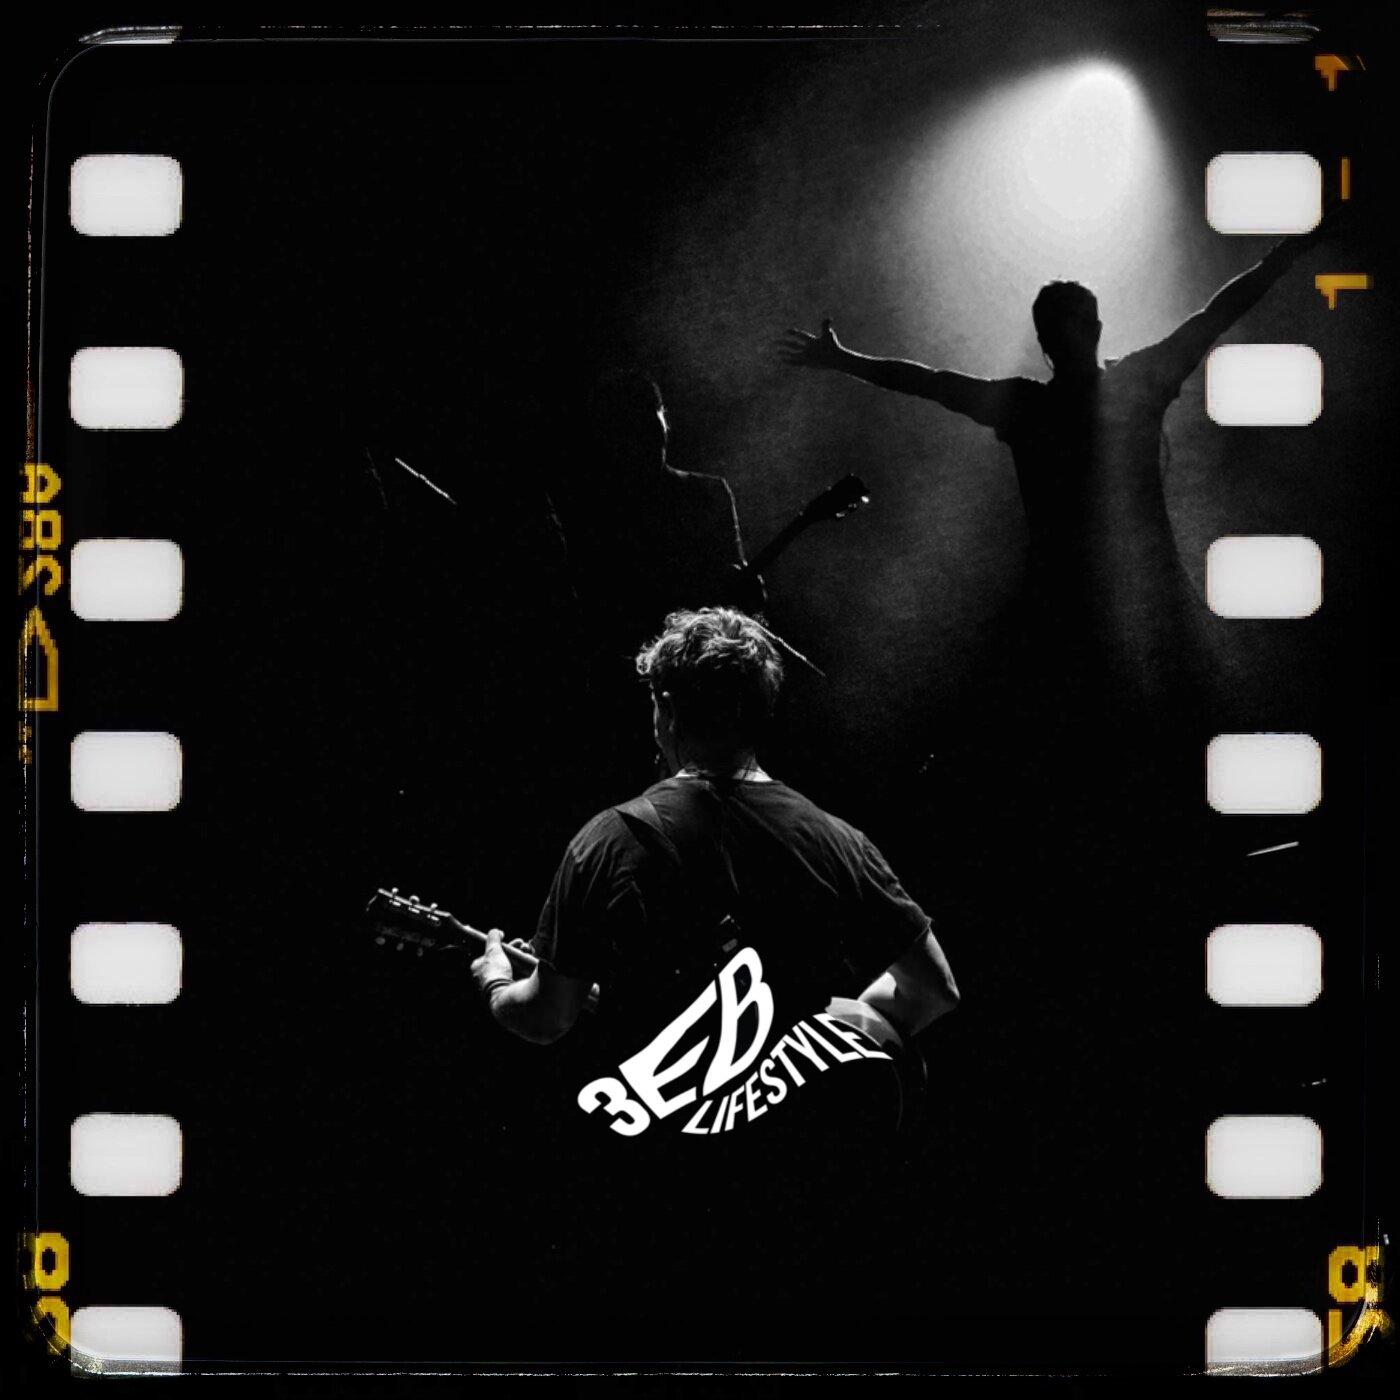 Film Noir_Shadow.JPG